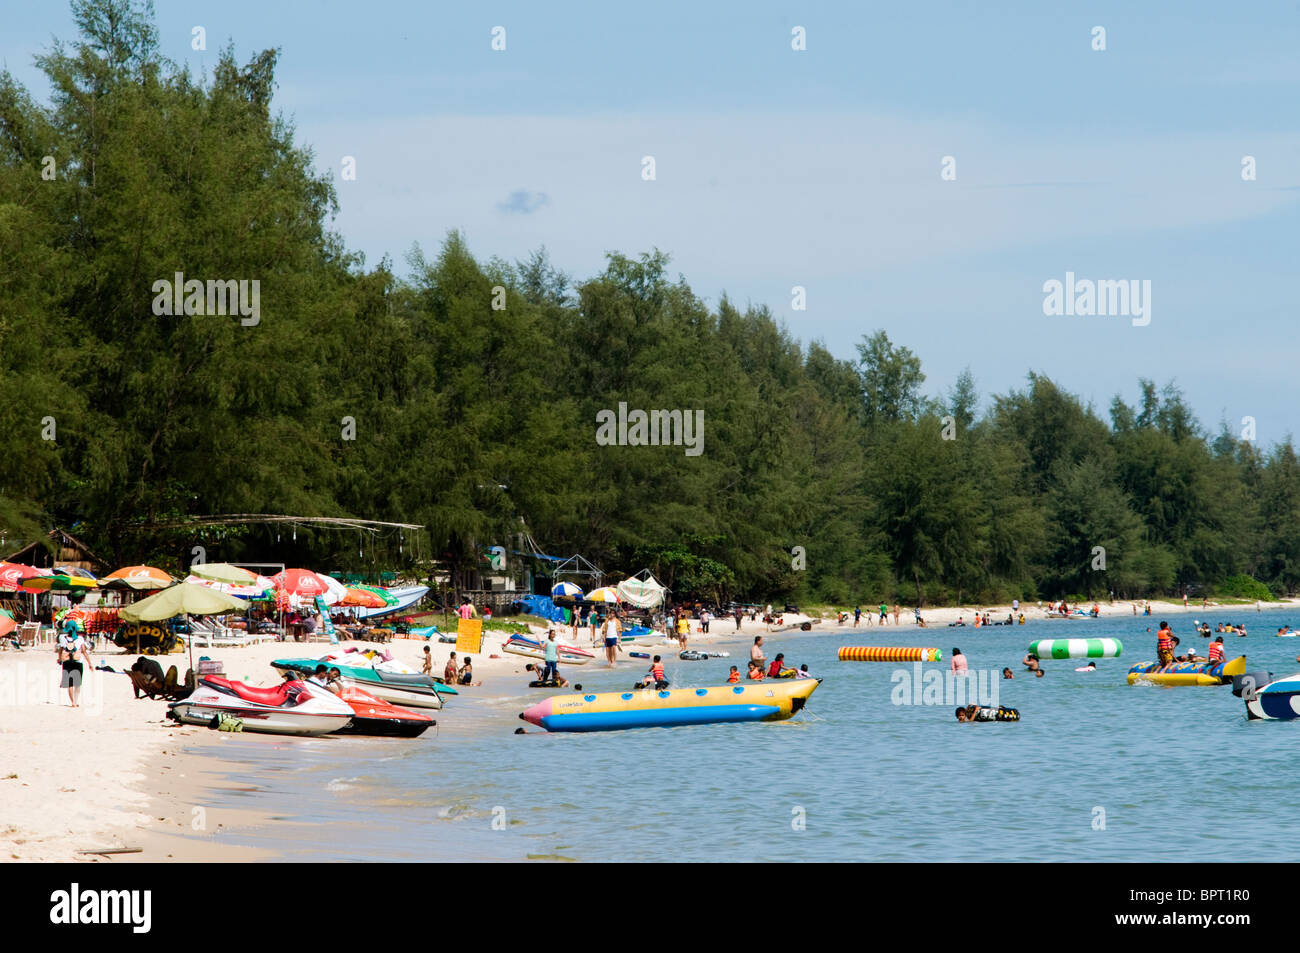 Ocheateal Beach, Sihanoukville, Cambodia Stock Photo